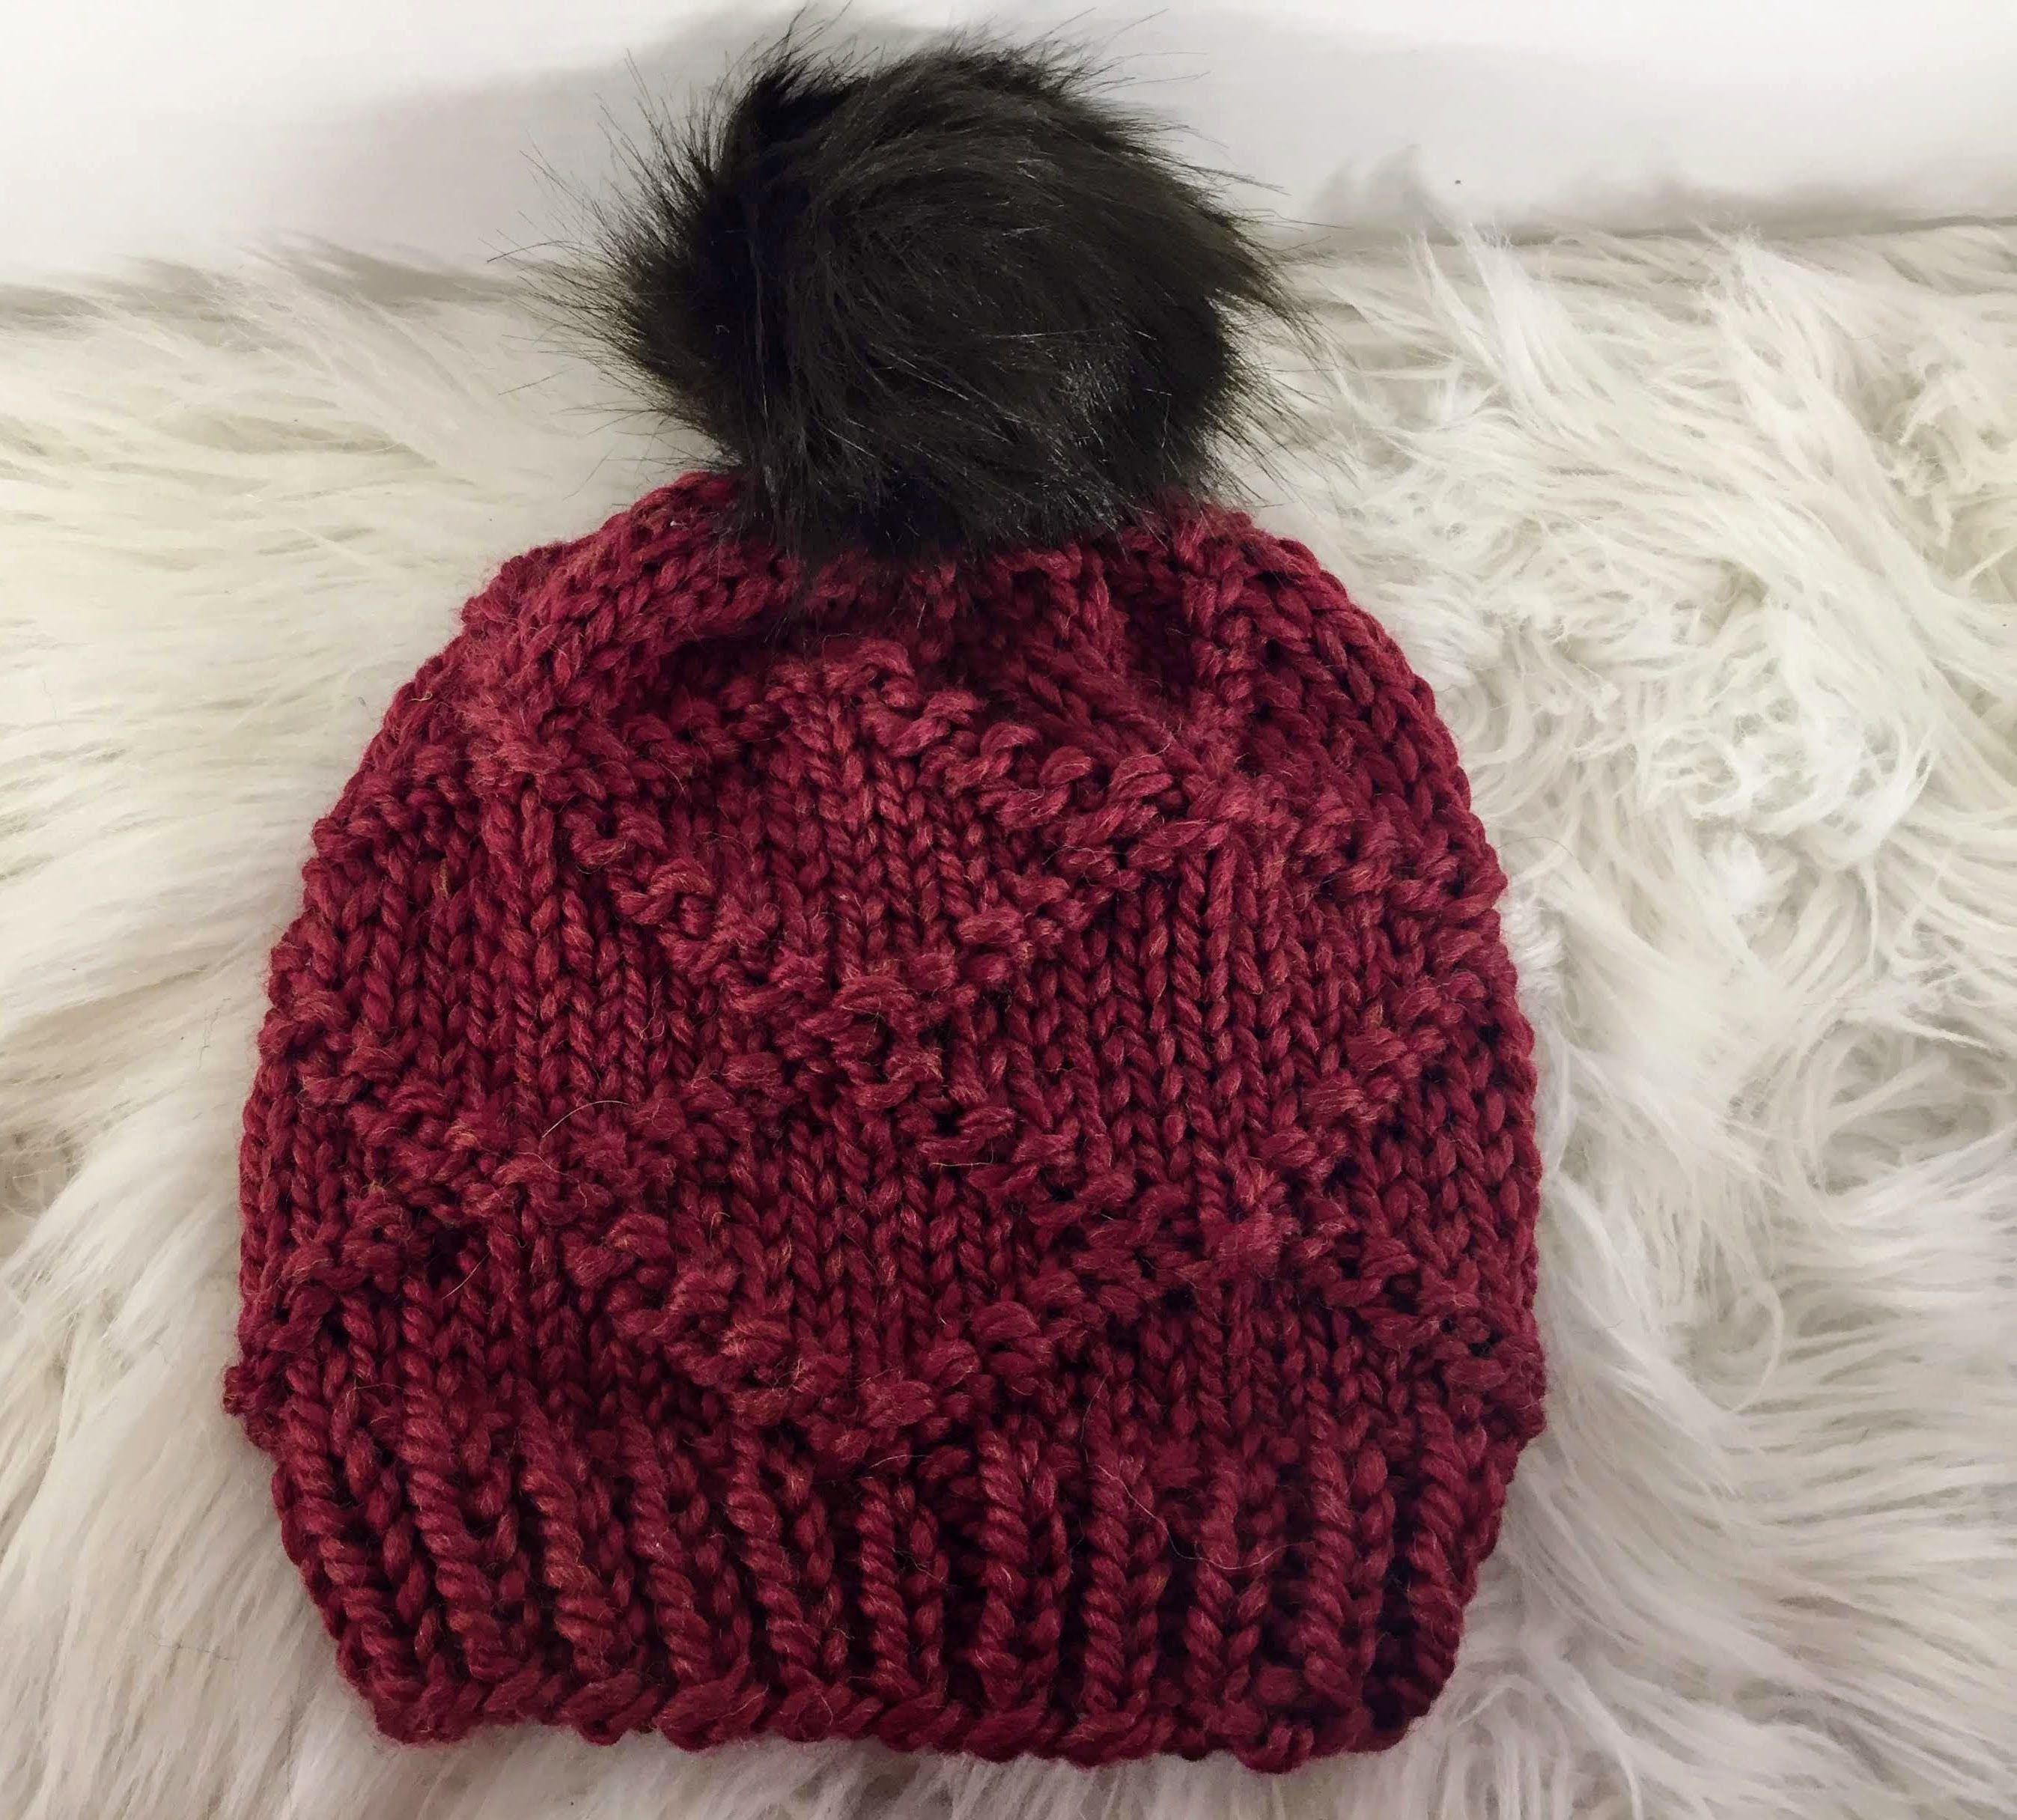 The Diamond Knit Pom Hat